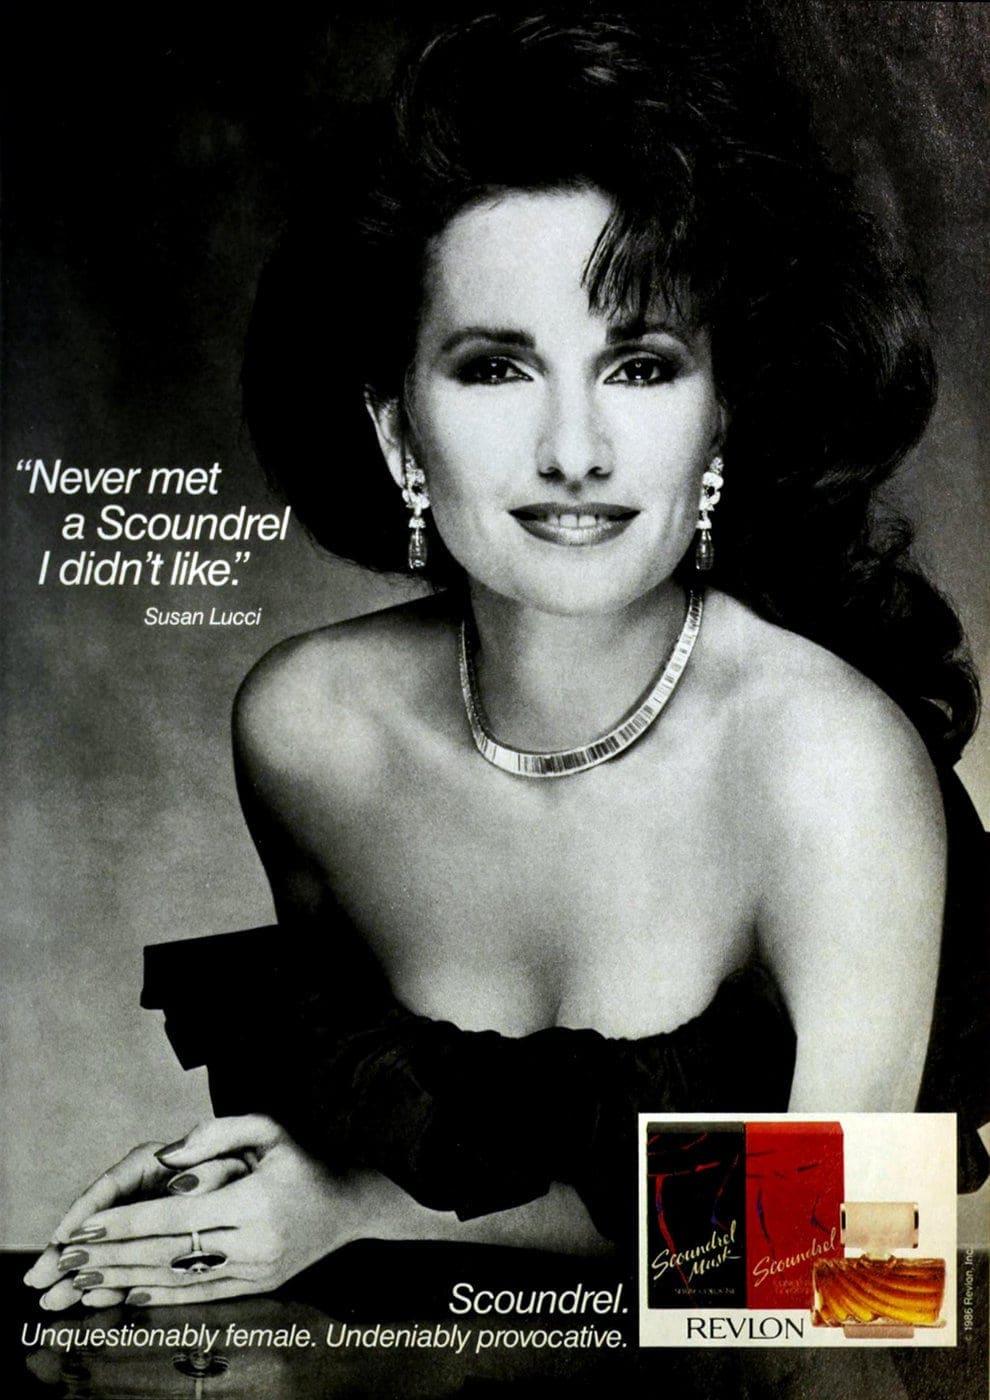 Vintage perfume - Susan Lucci for Scoundrel - 1987